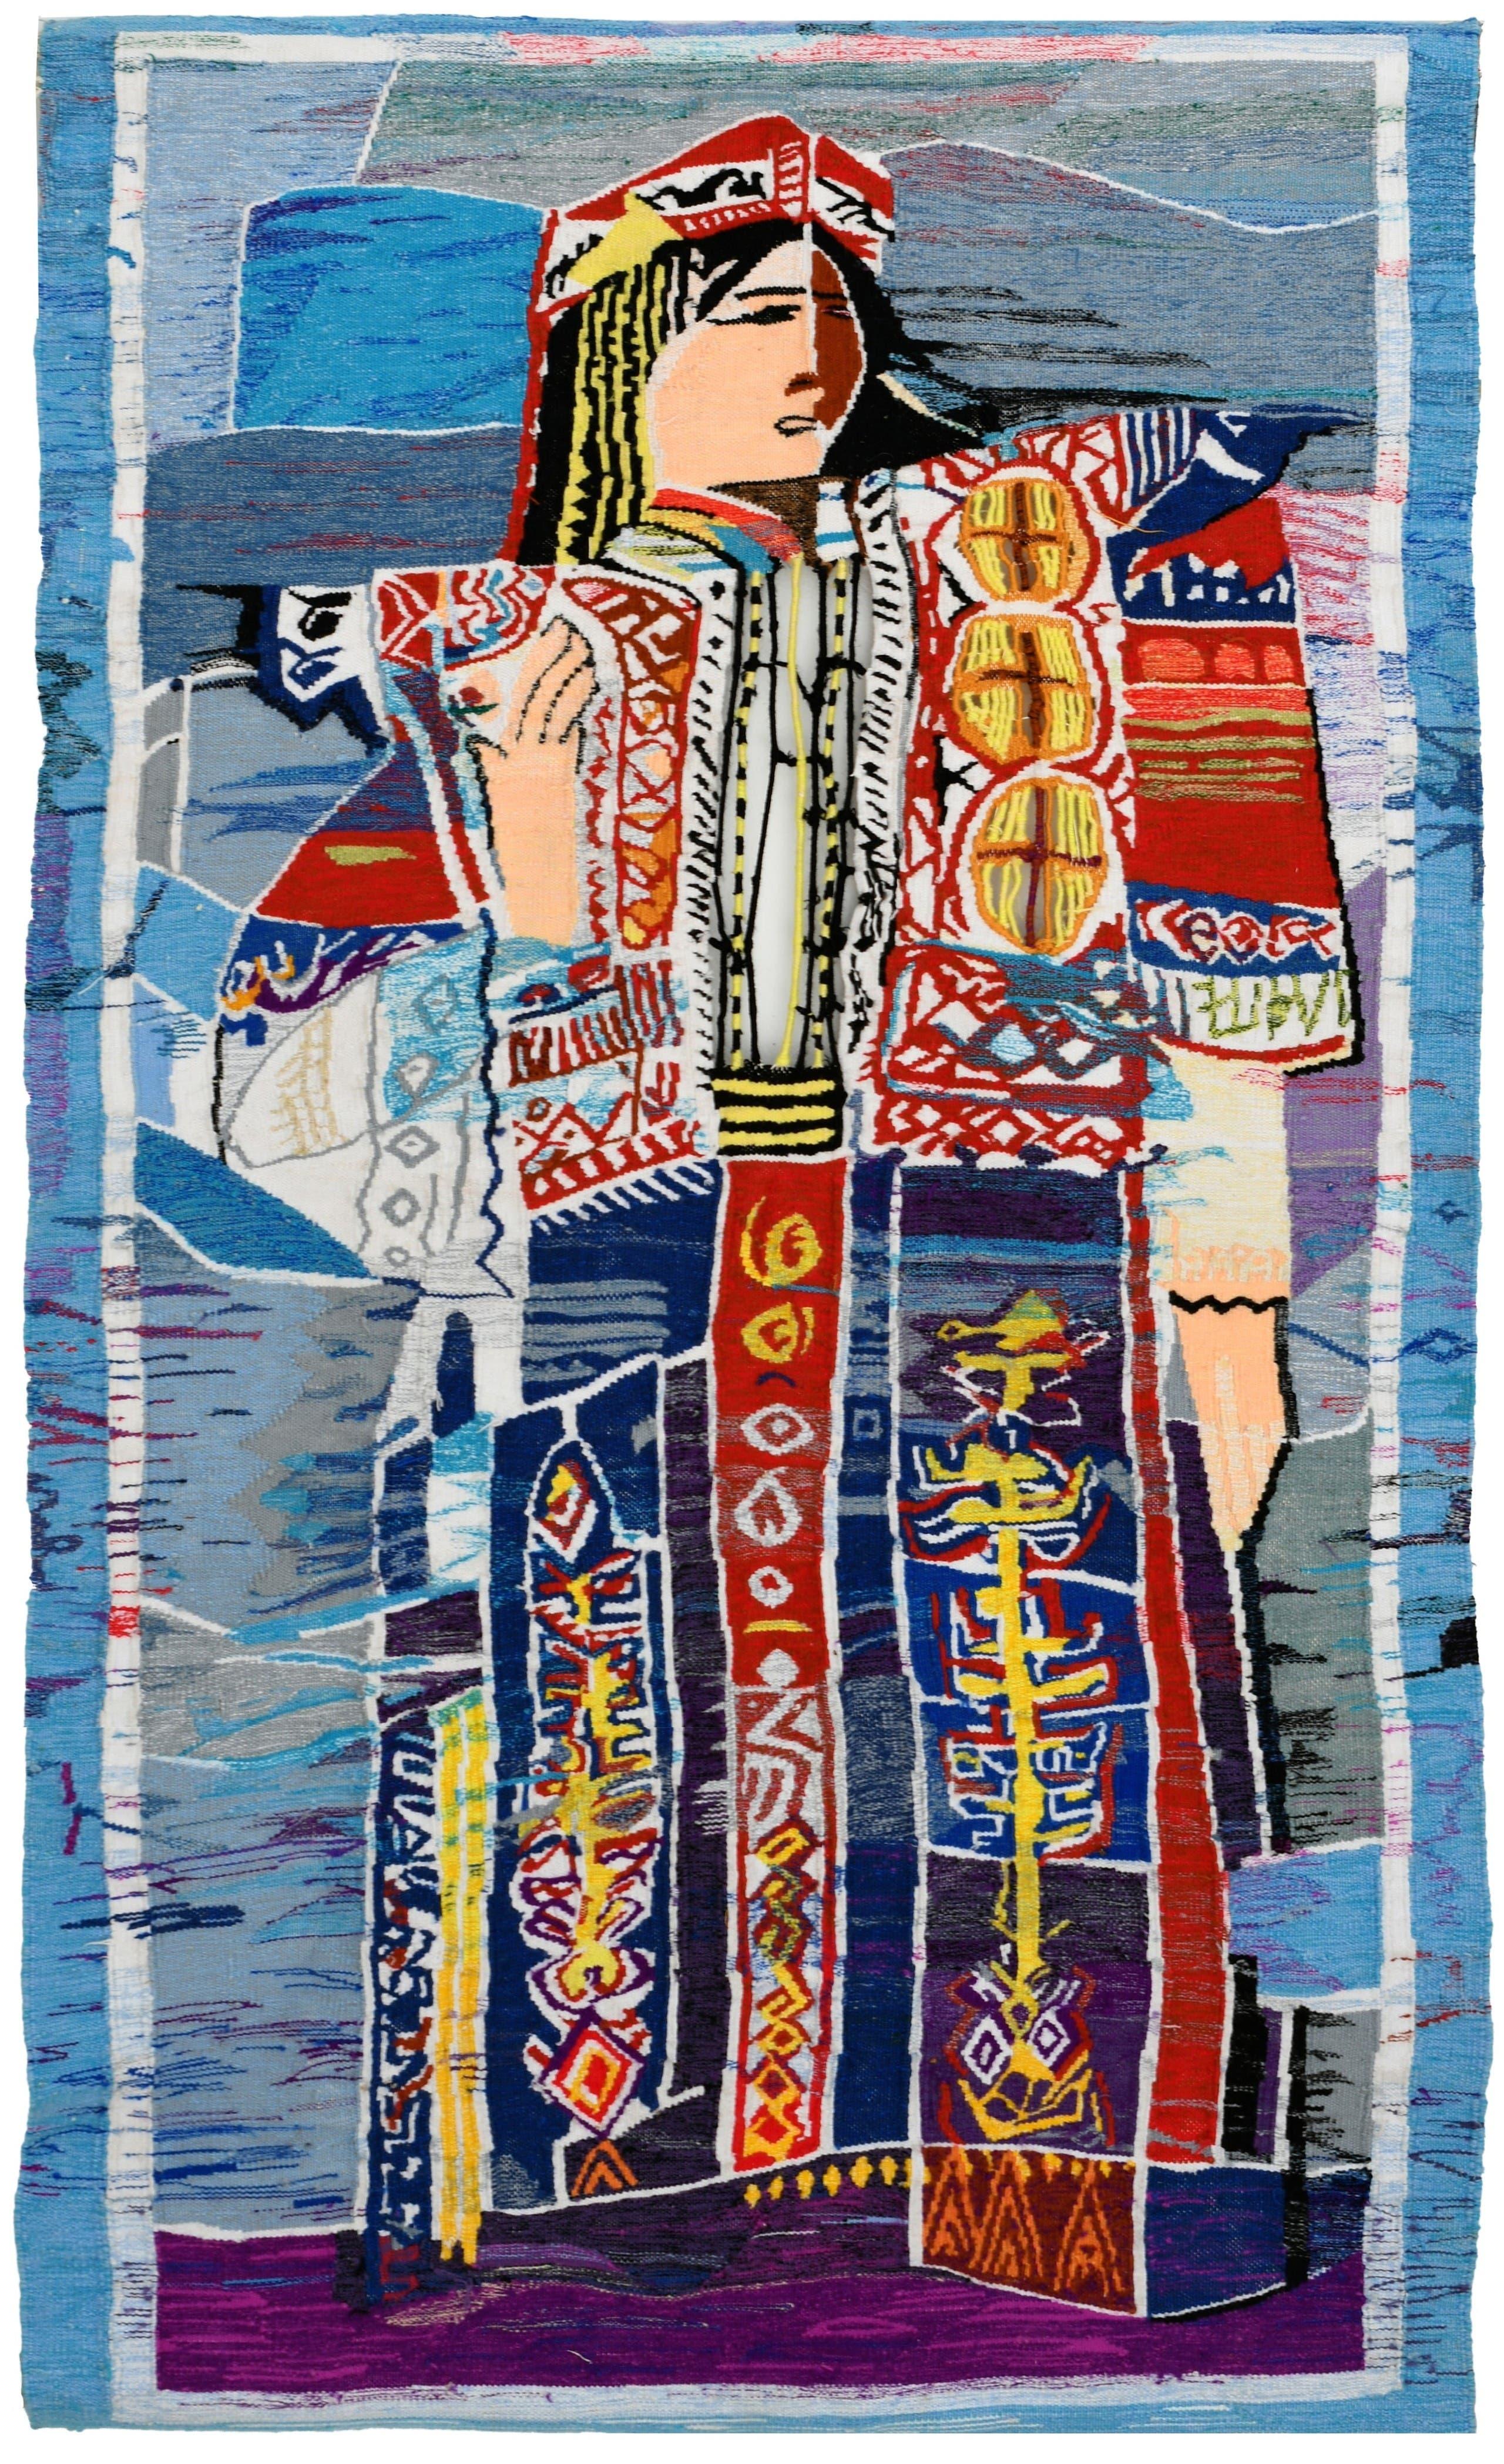 Safia Farhat, La Mariee, 1963, Tapestry, 172 x 100 cm. (Image courtesy of Barjeel Art Foundation, Sharjah.)